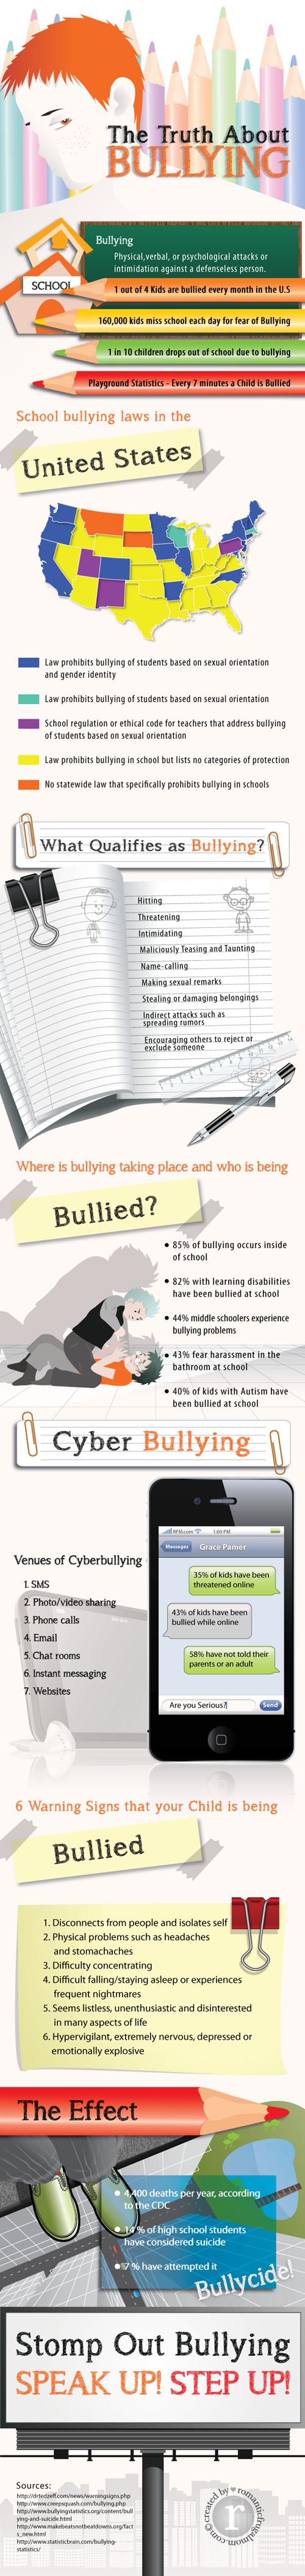 bullying en ingles 2